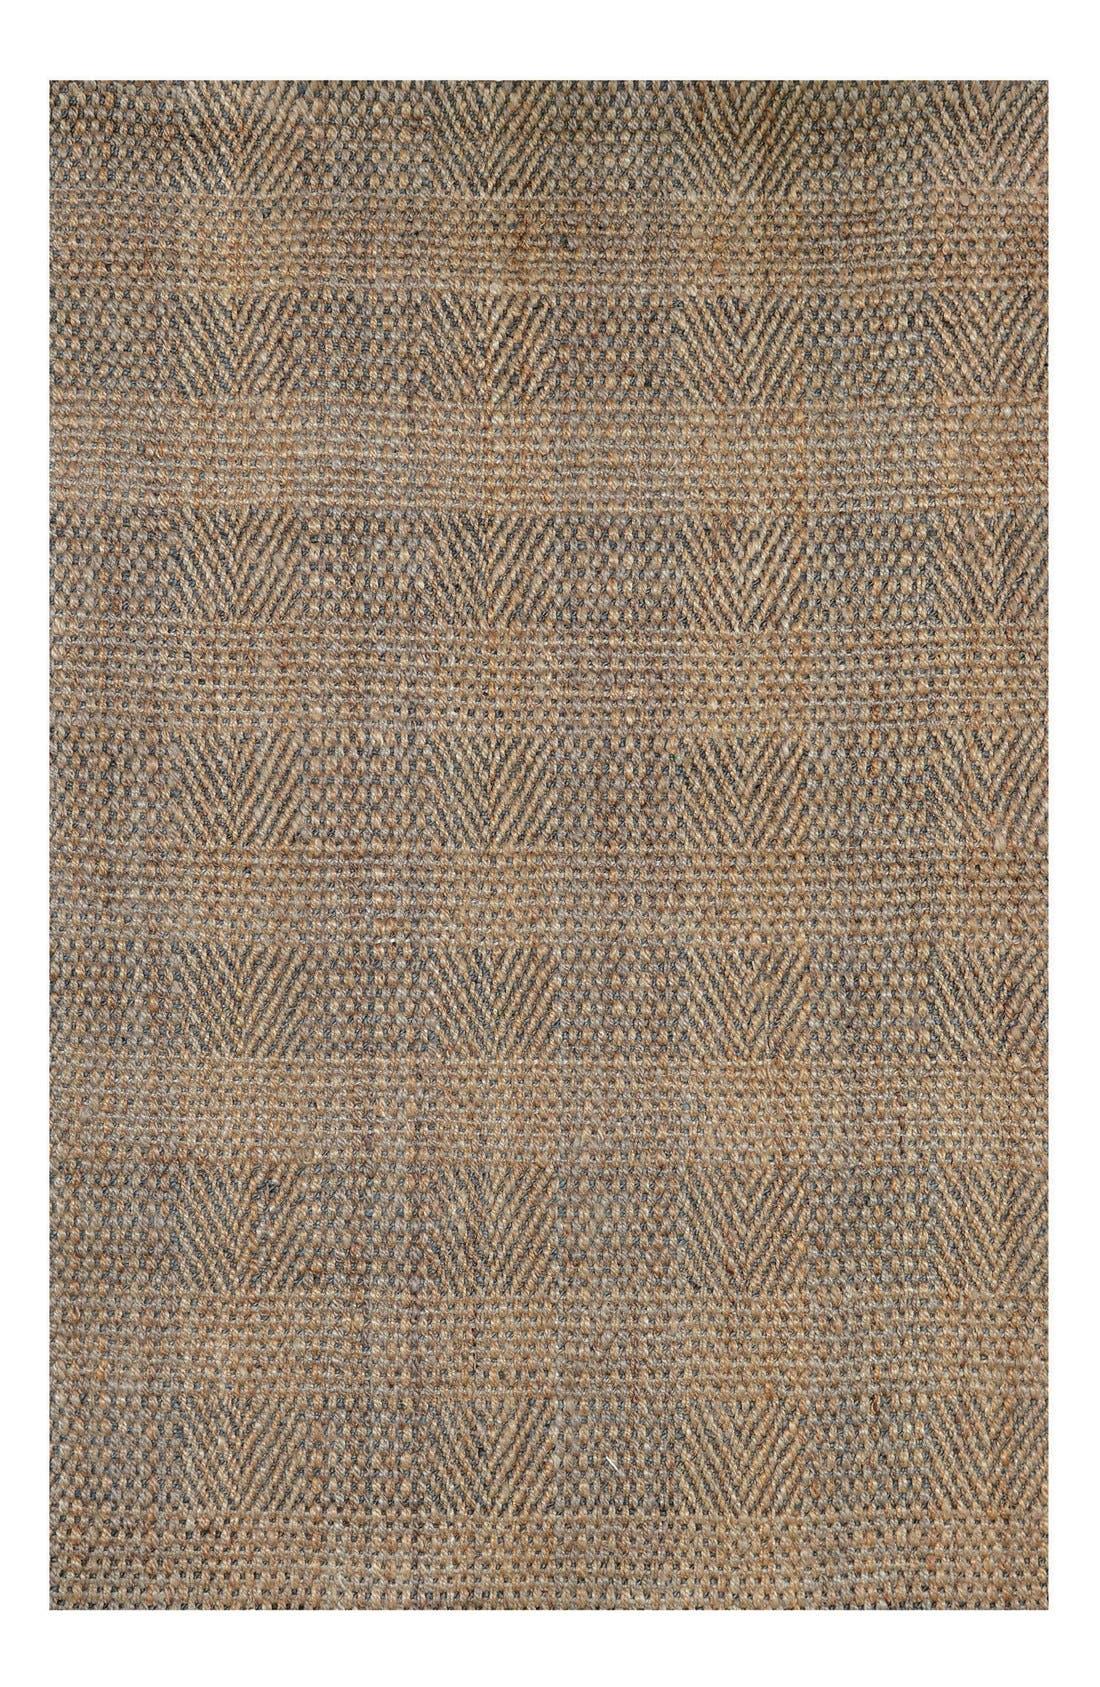 Tiles Rug,                         Main,                         color, 250